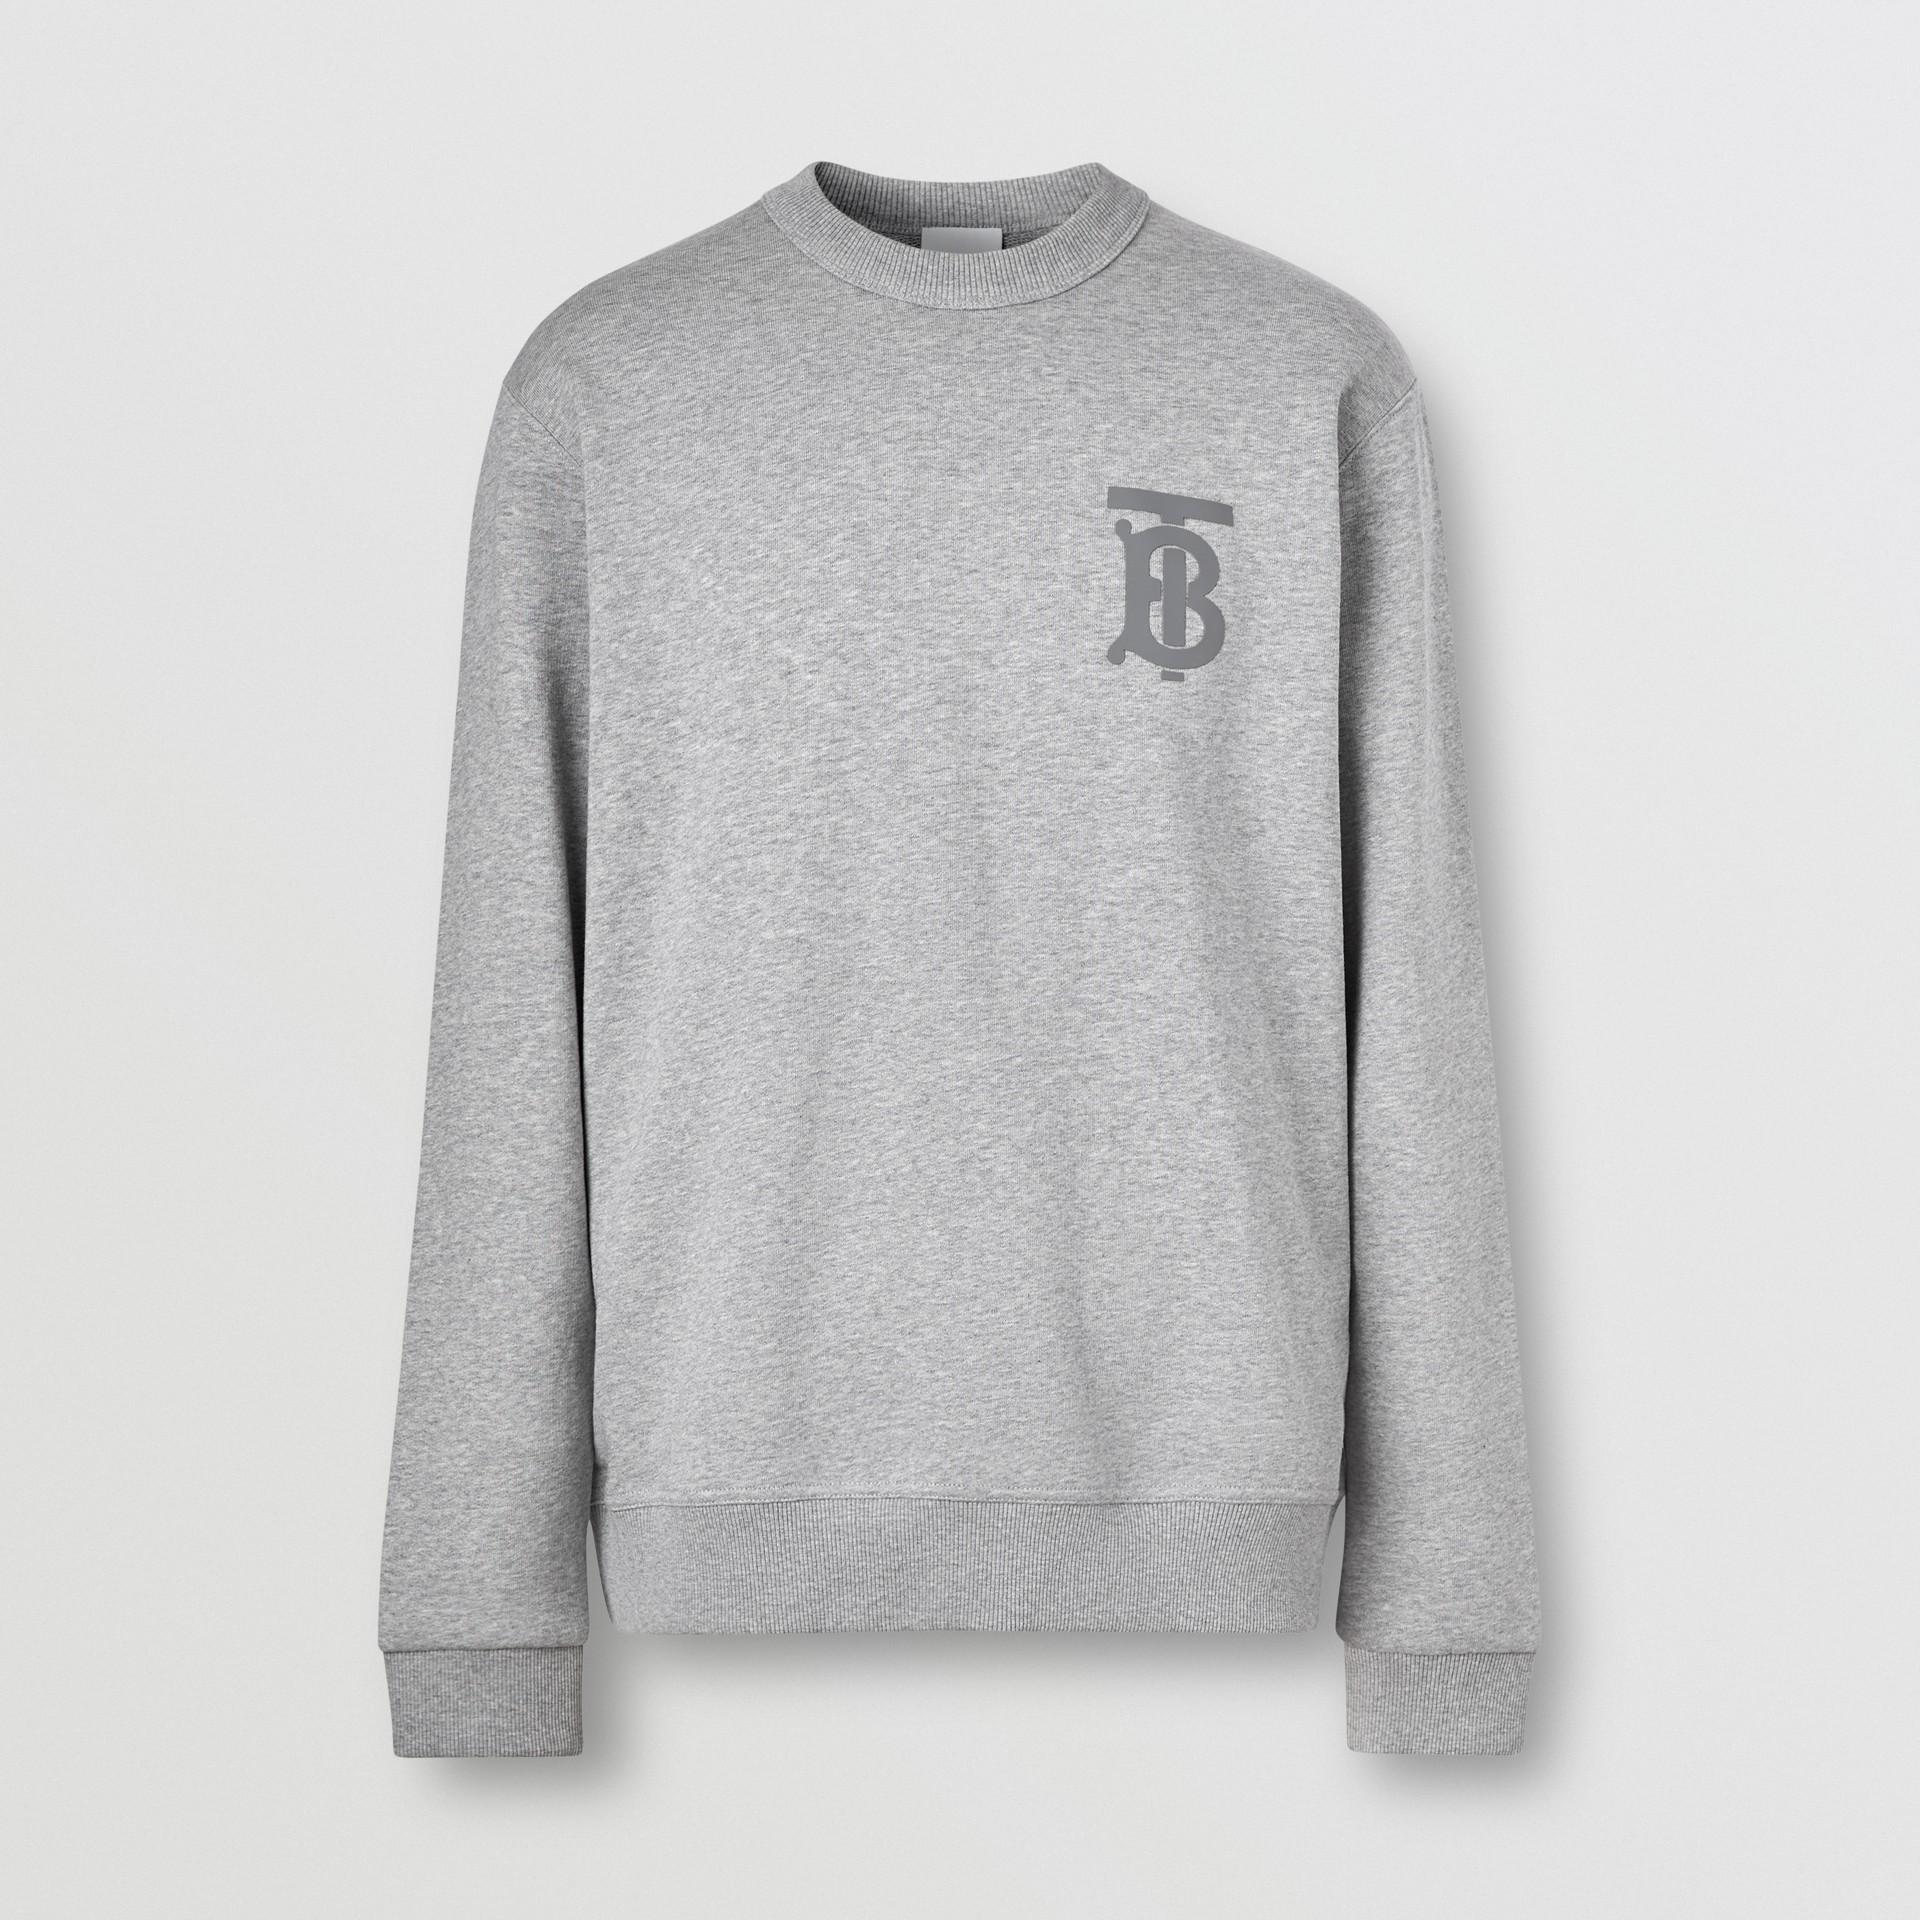 Monogram Motif Cotton Sweatshirt in Pale Grey Melange - Men | Burberry United Kingdom - gallery image 3